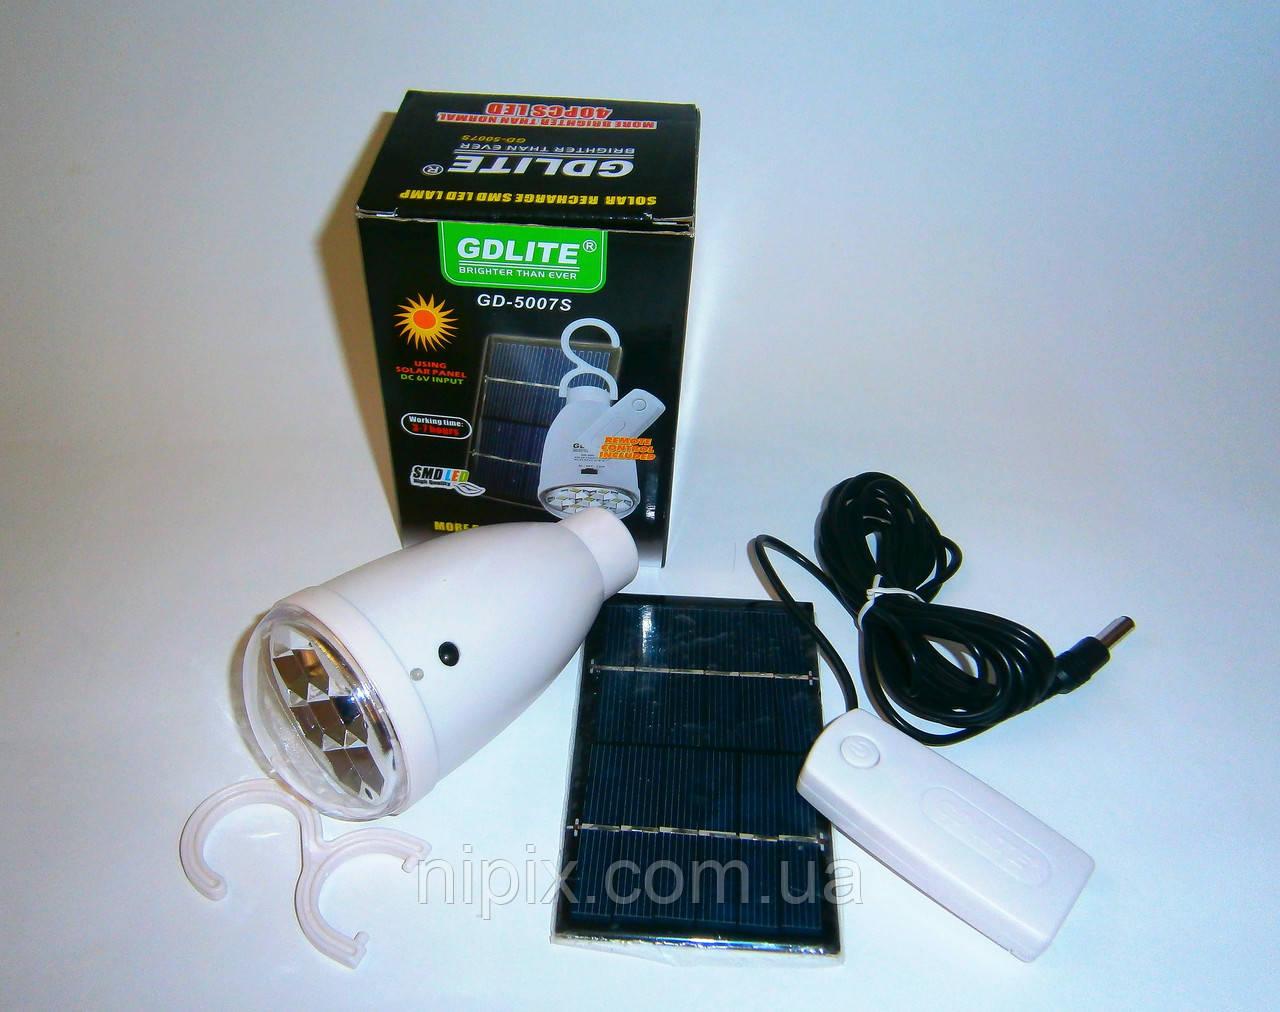 Аккумуляторная лампа-фонарь GD 5007S на солнечной батарее